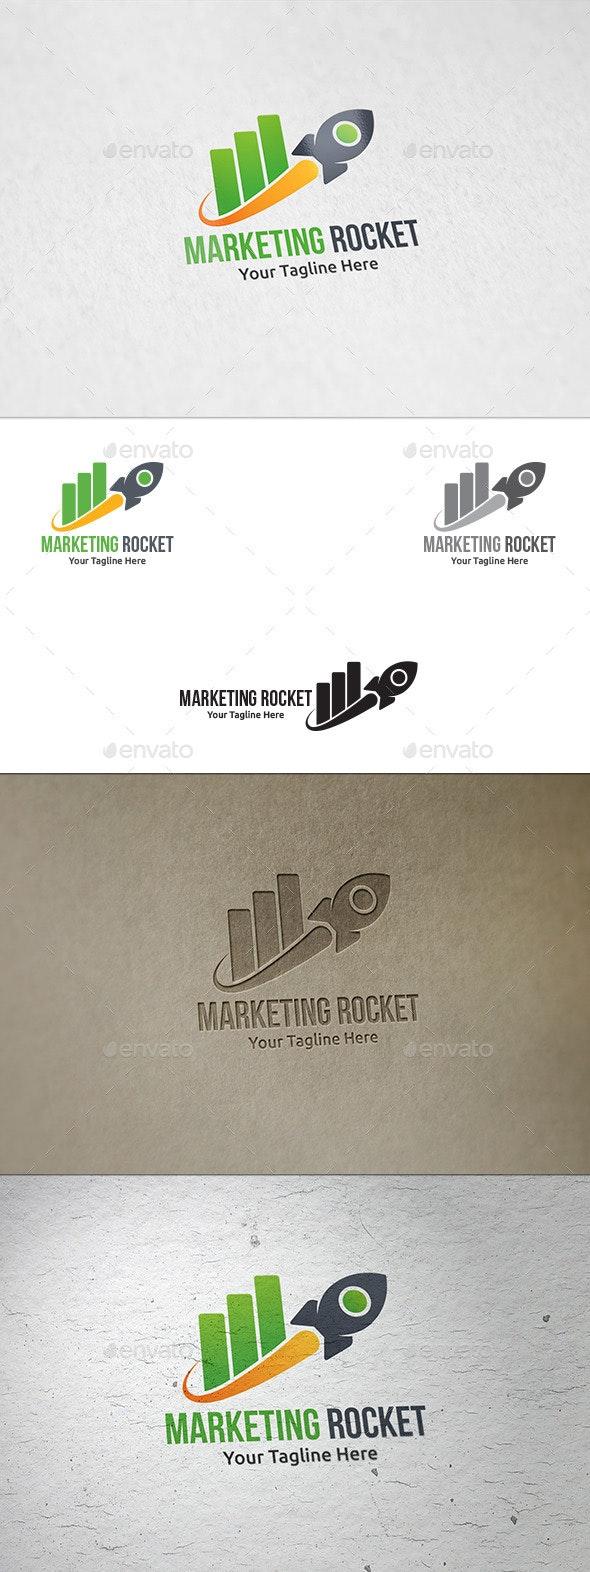 Marketing Rocket - Logo Template - Symbols Logo Templates